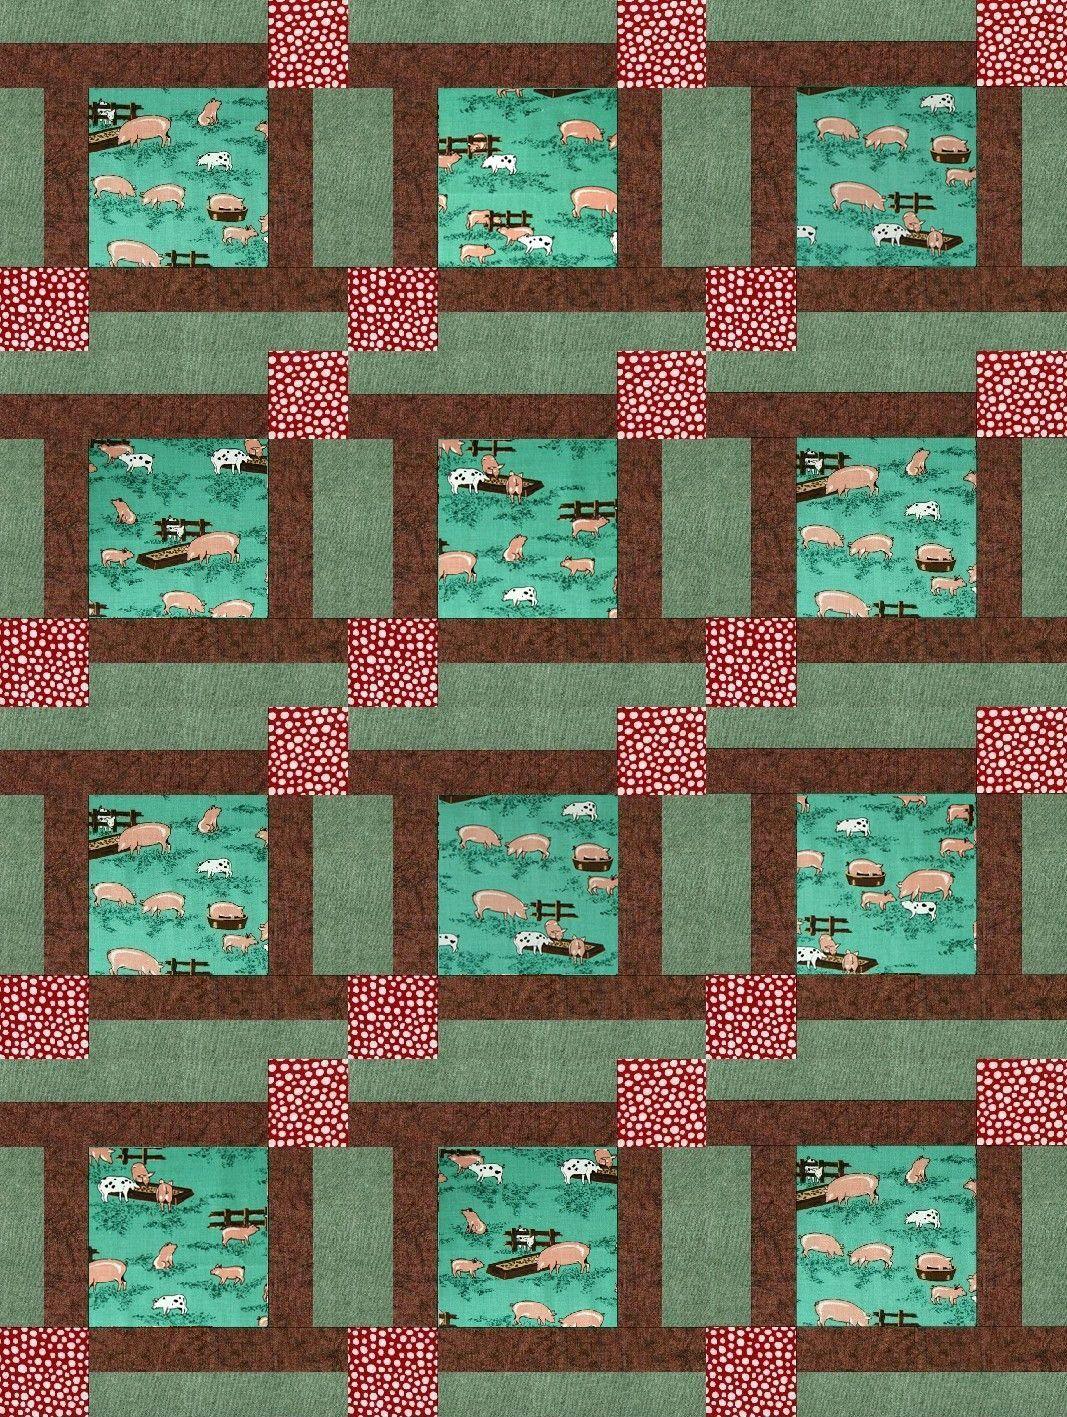 My Country Pig Farm PRE-CUT Quilt Kit Blocks   Farm quilt, Farming ... : patchwork quilt kits pre cut - Adamdwight.com